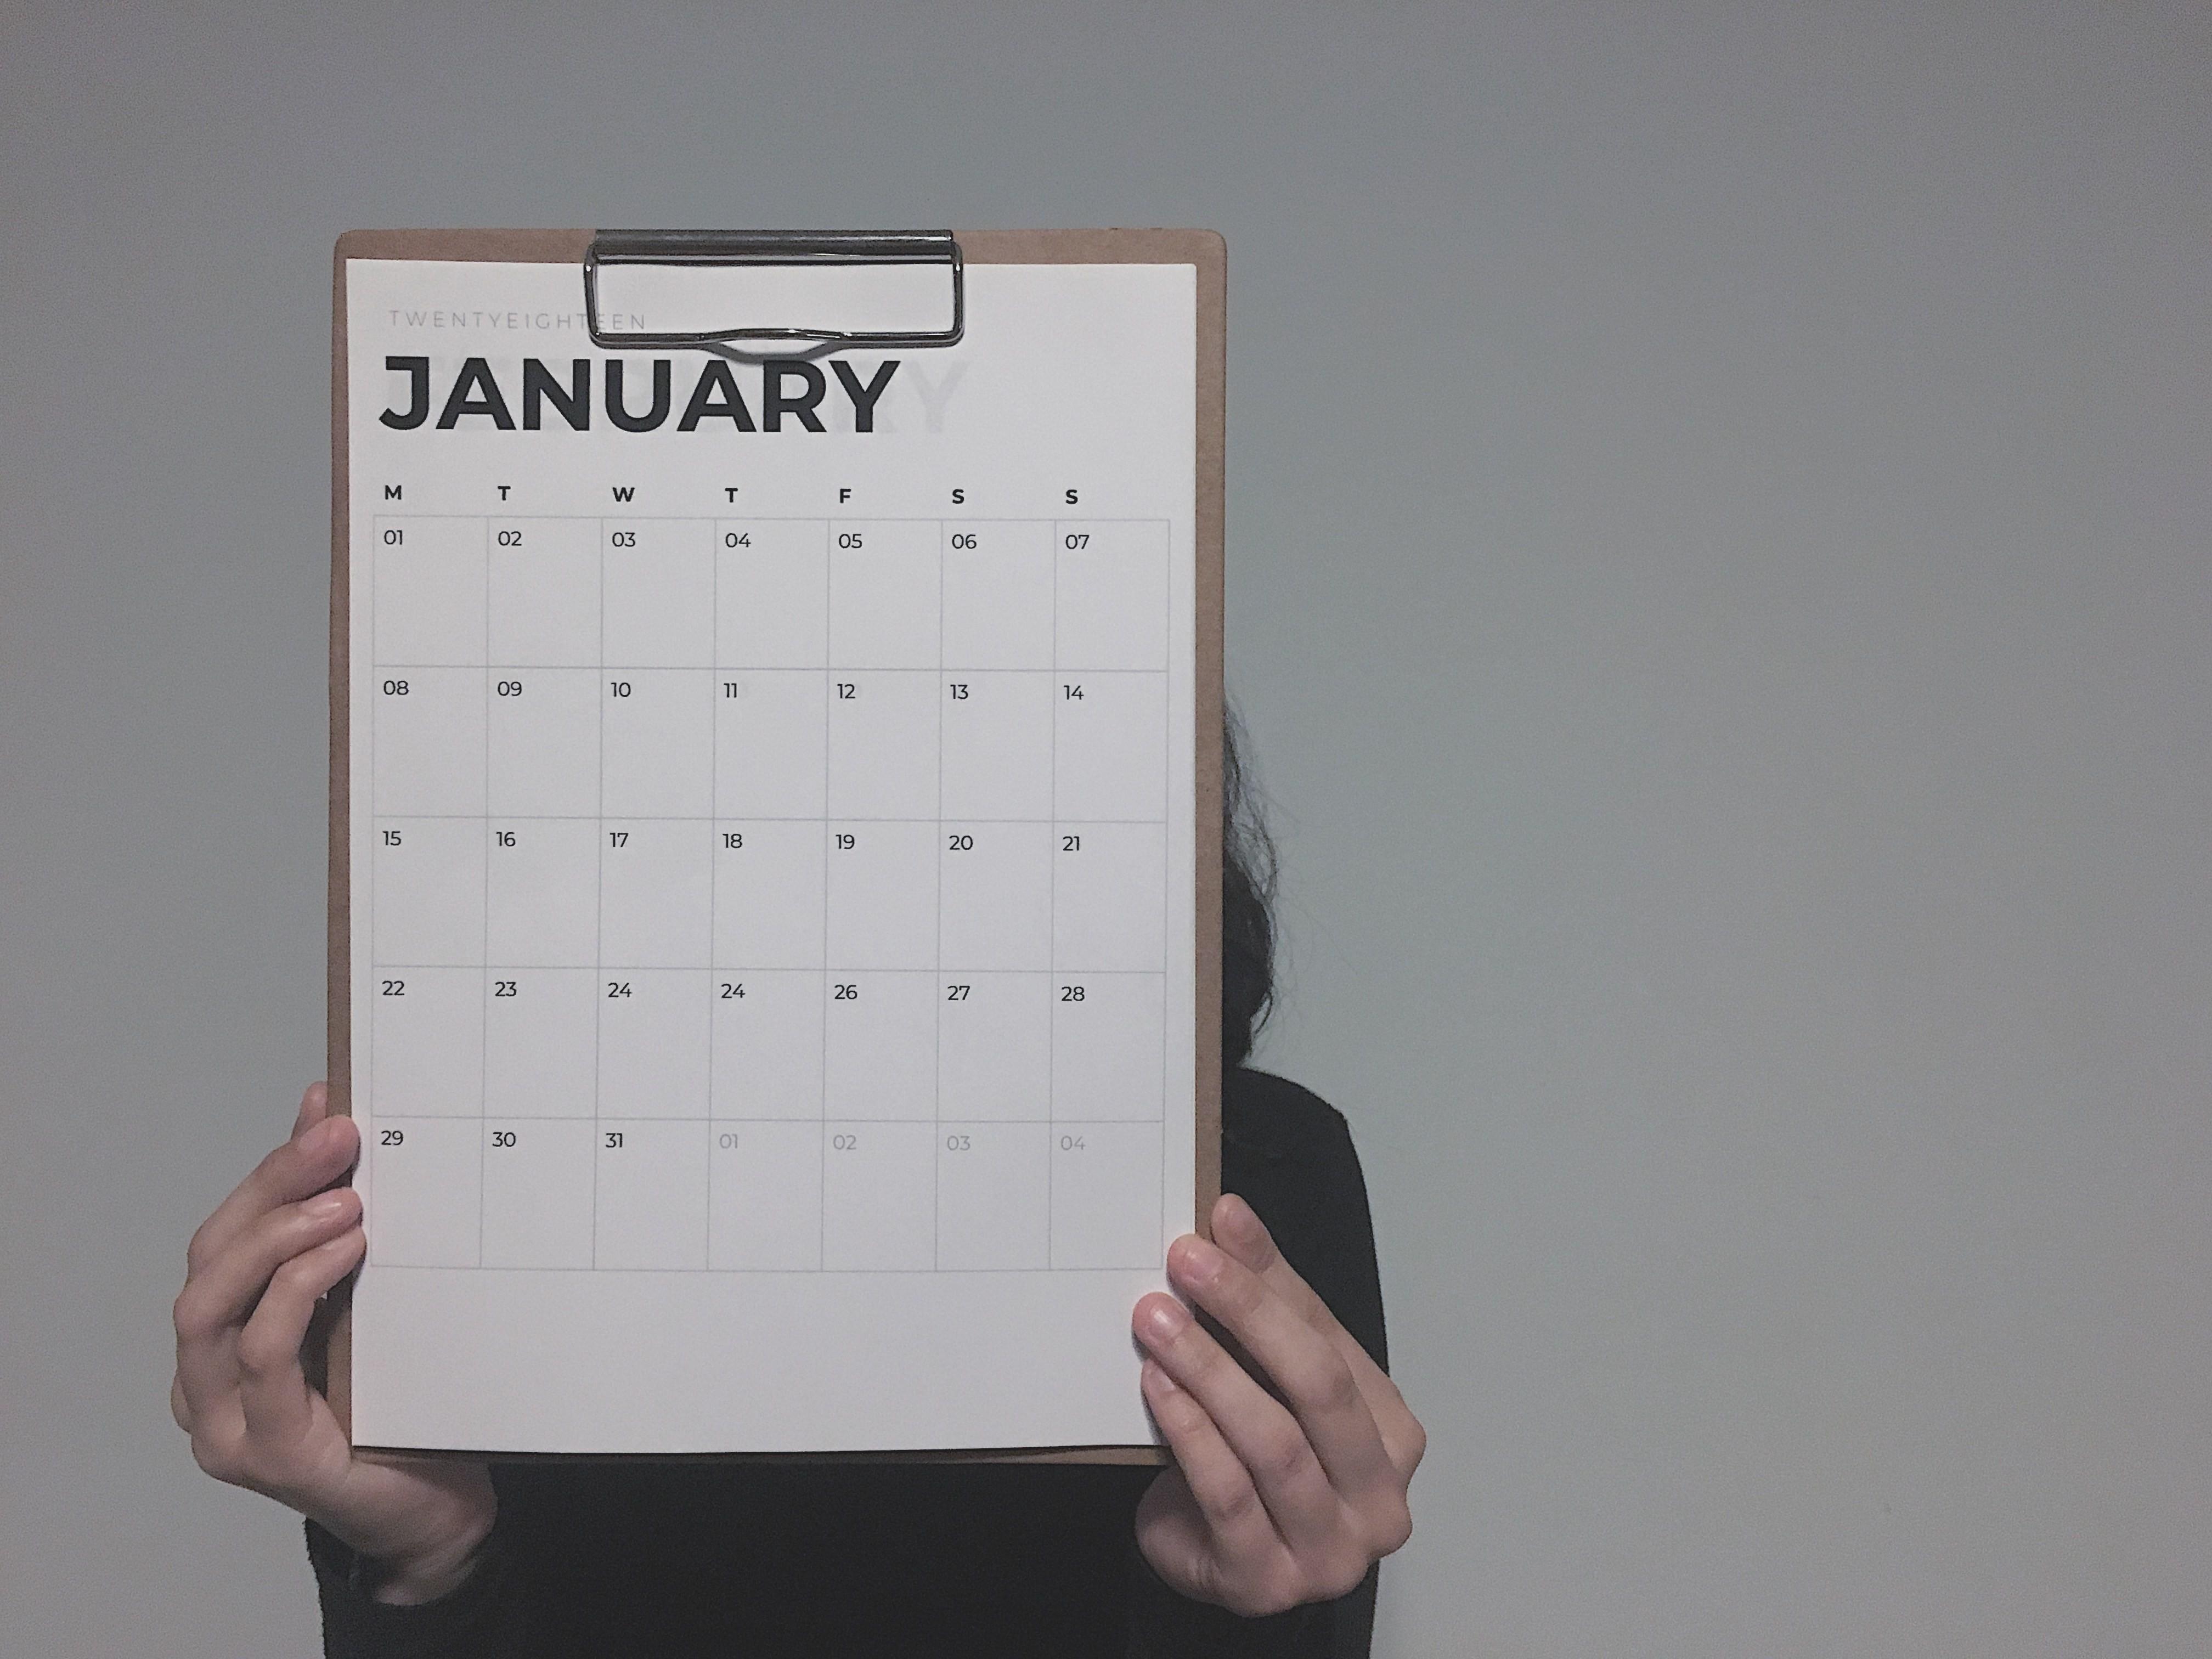 Calendario Imprimir Minimalista Más Caliente Calendário 2018 Minimalista Para Imprimir – Viva Sustentável Of Calendario Imprimir Minimalista Más Caliente July Wallpaper Calendar & Quote Tarjetas Pinterest